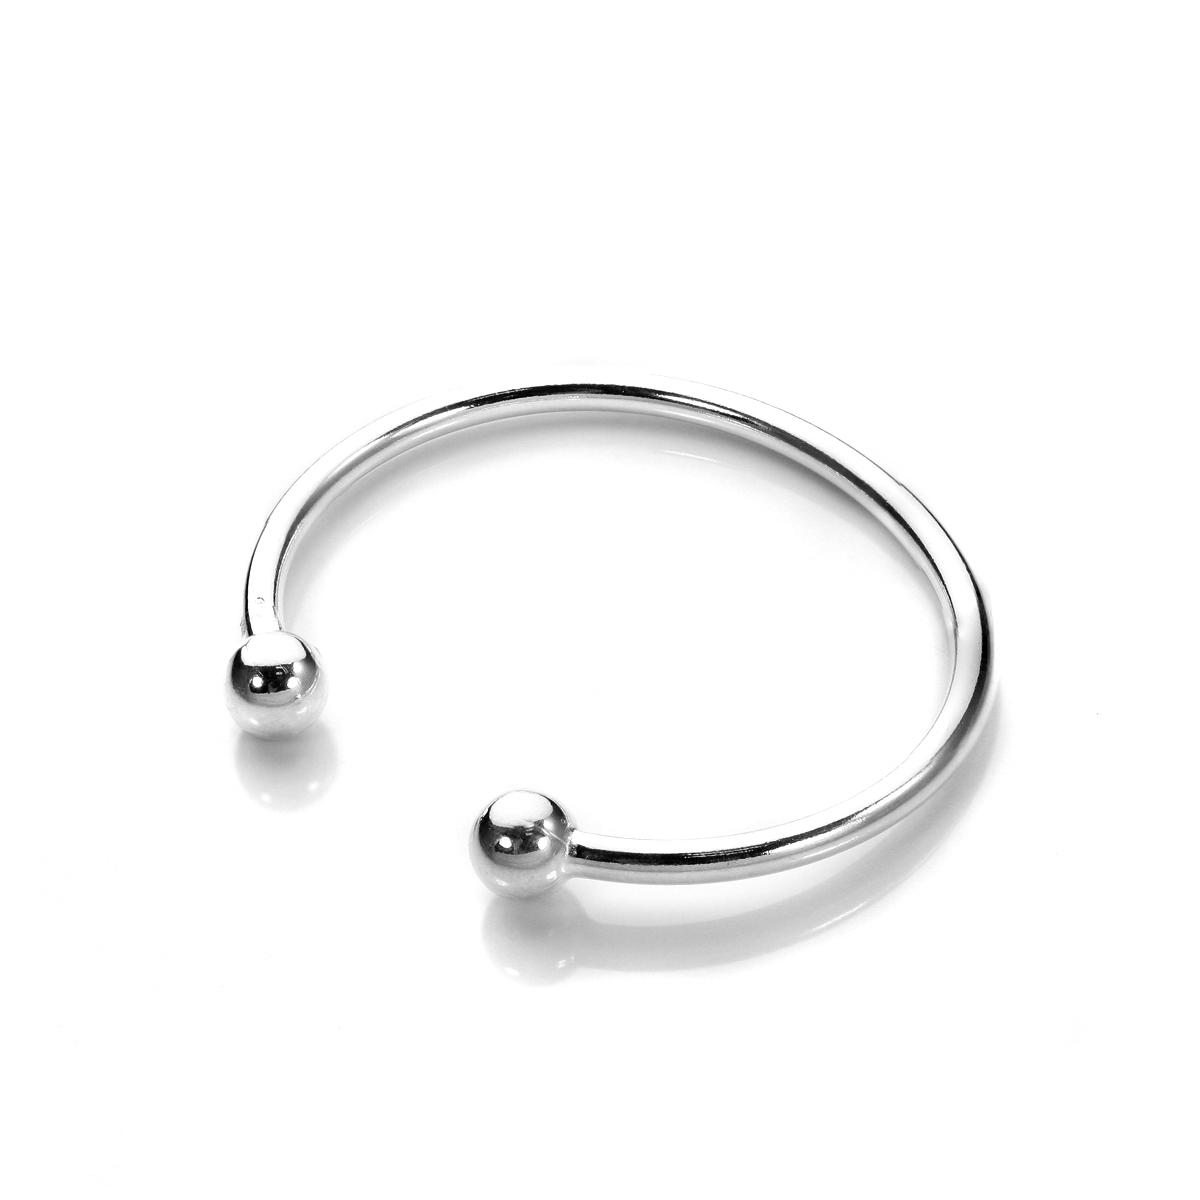 Sterling Silver 925 Baby Christening Torque Bracelet